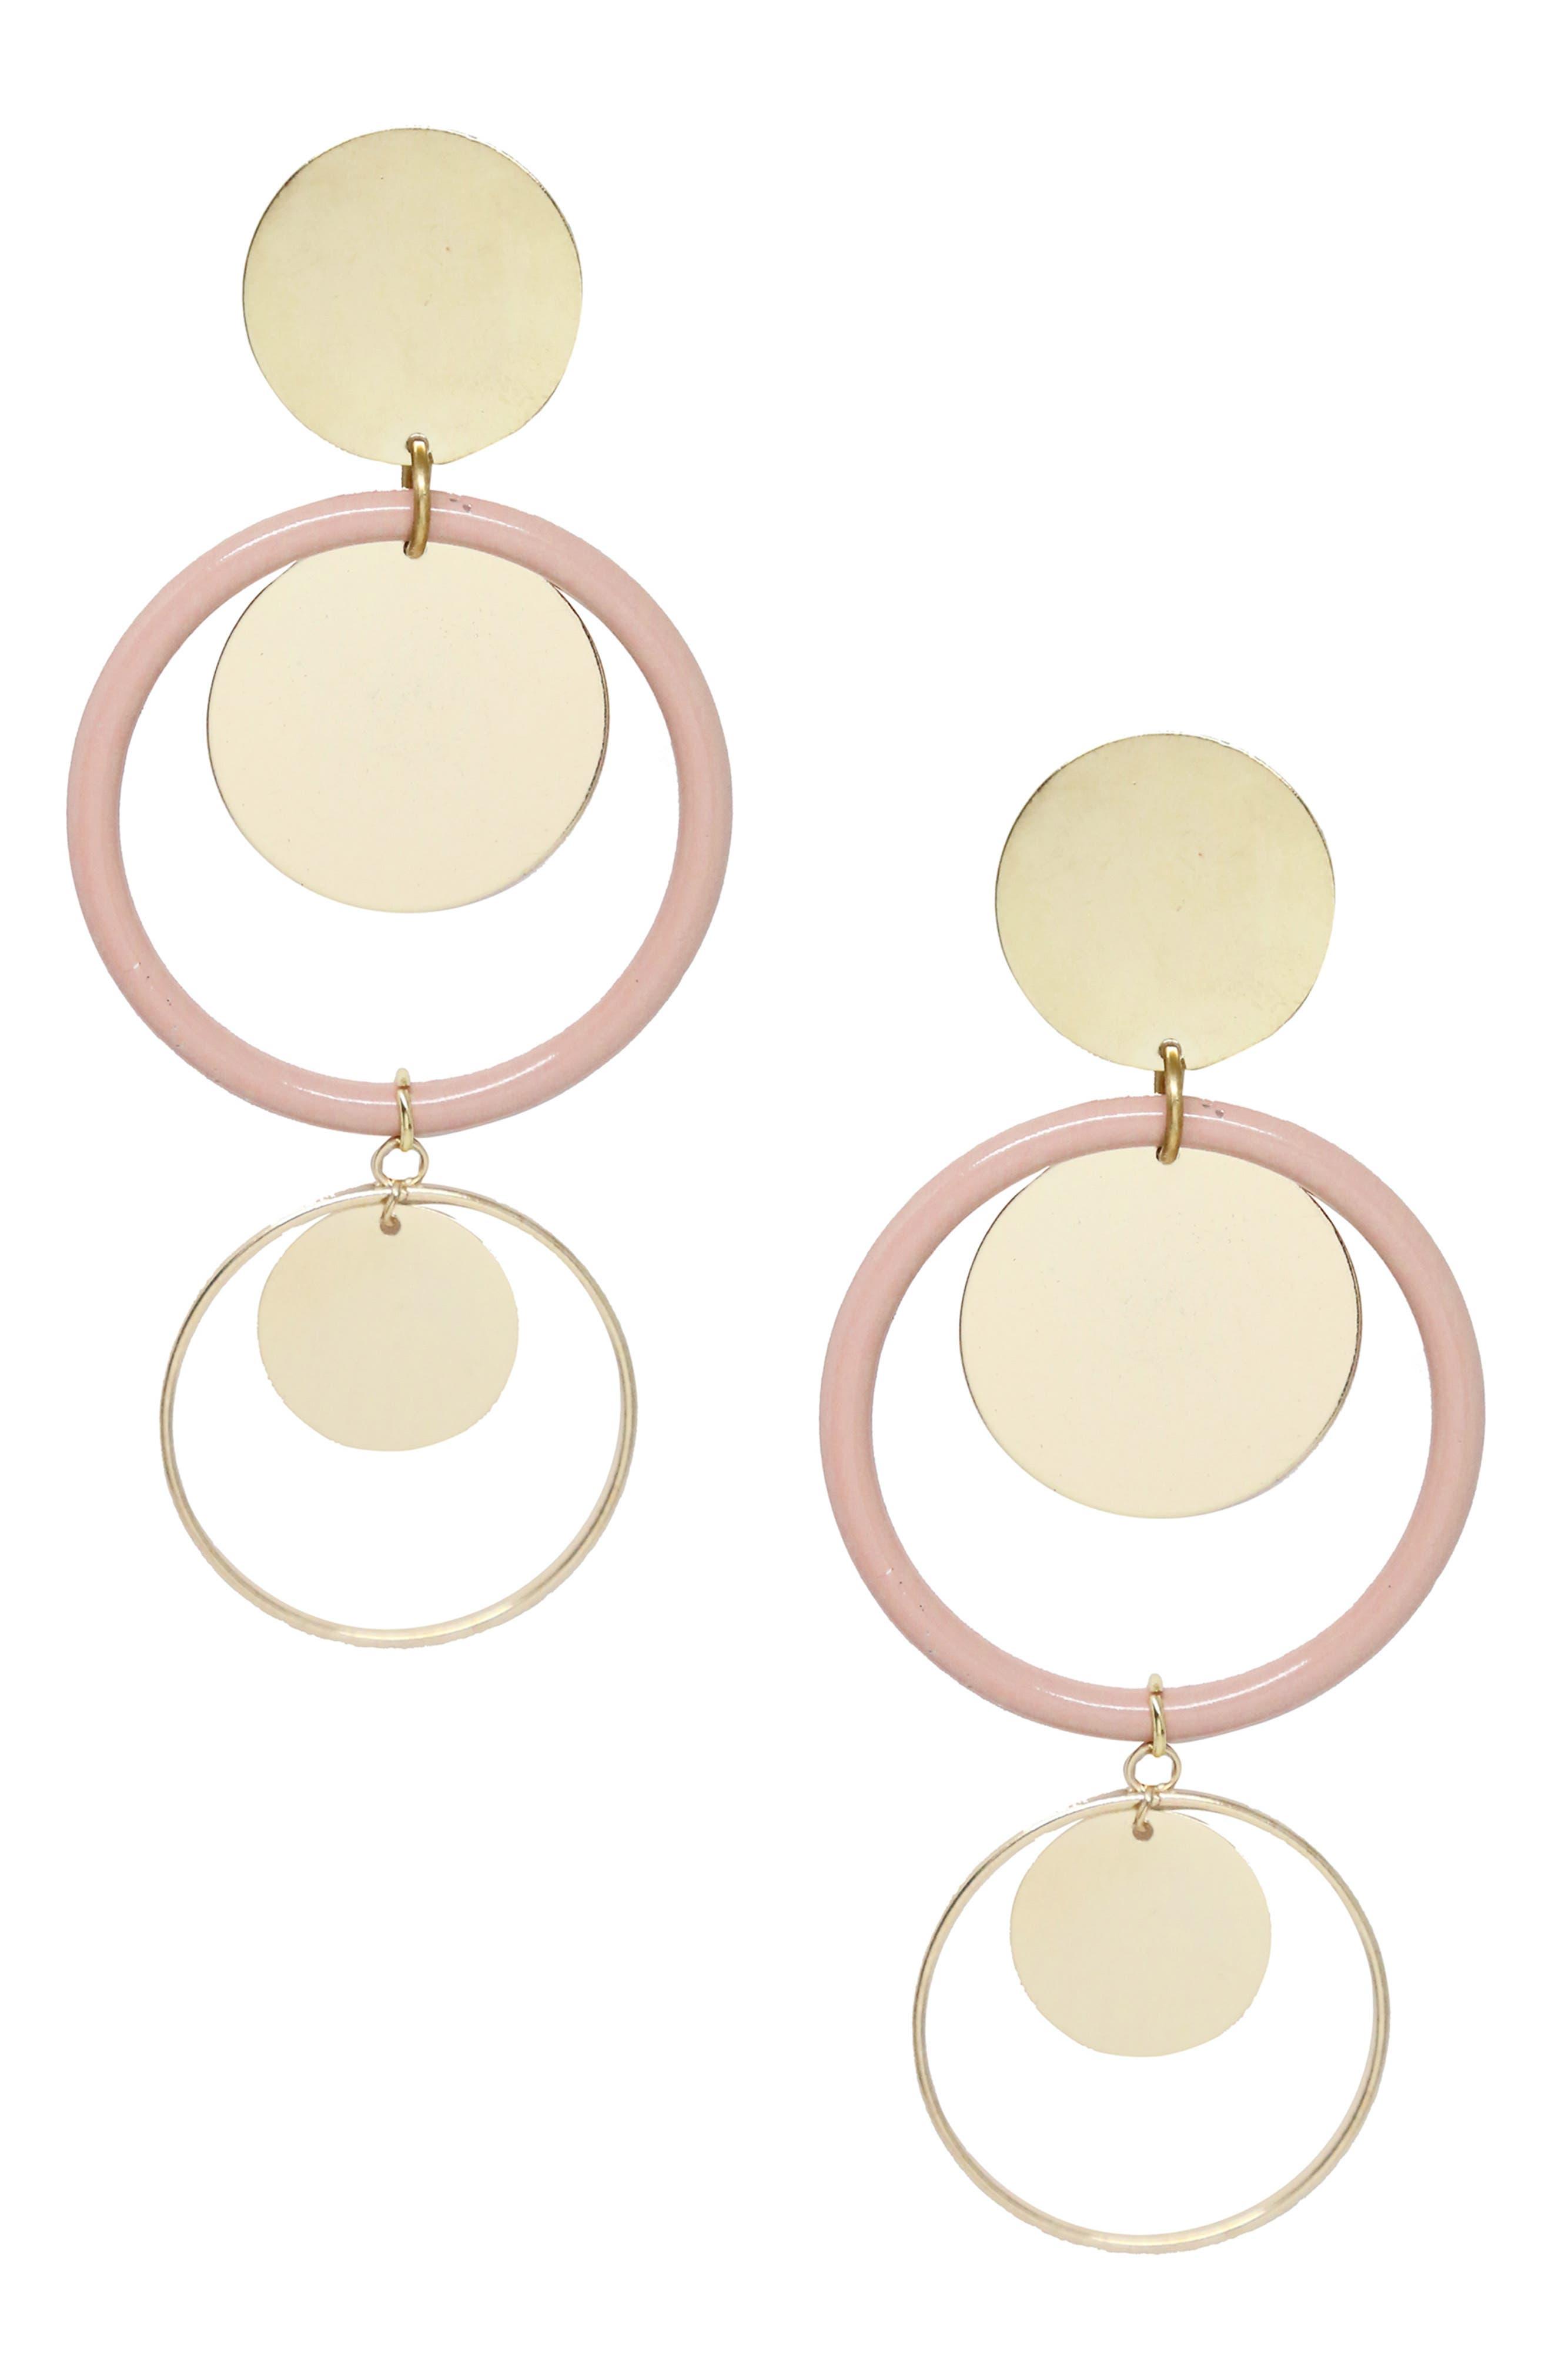 ETTIKA Circle Geo Drop Earrings in Light Pink/ Gold